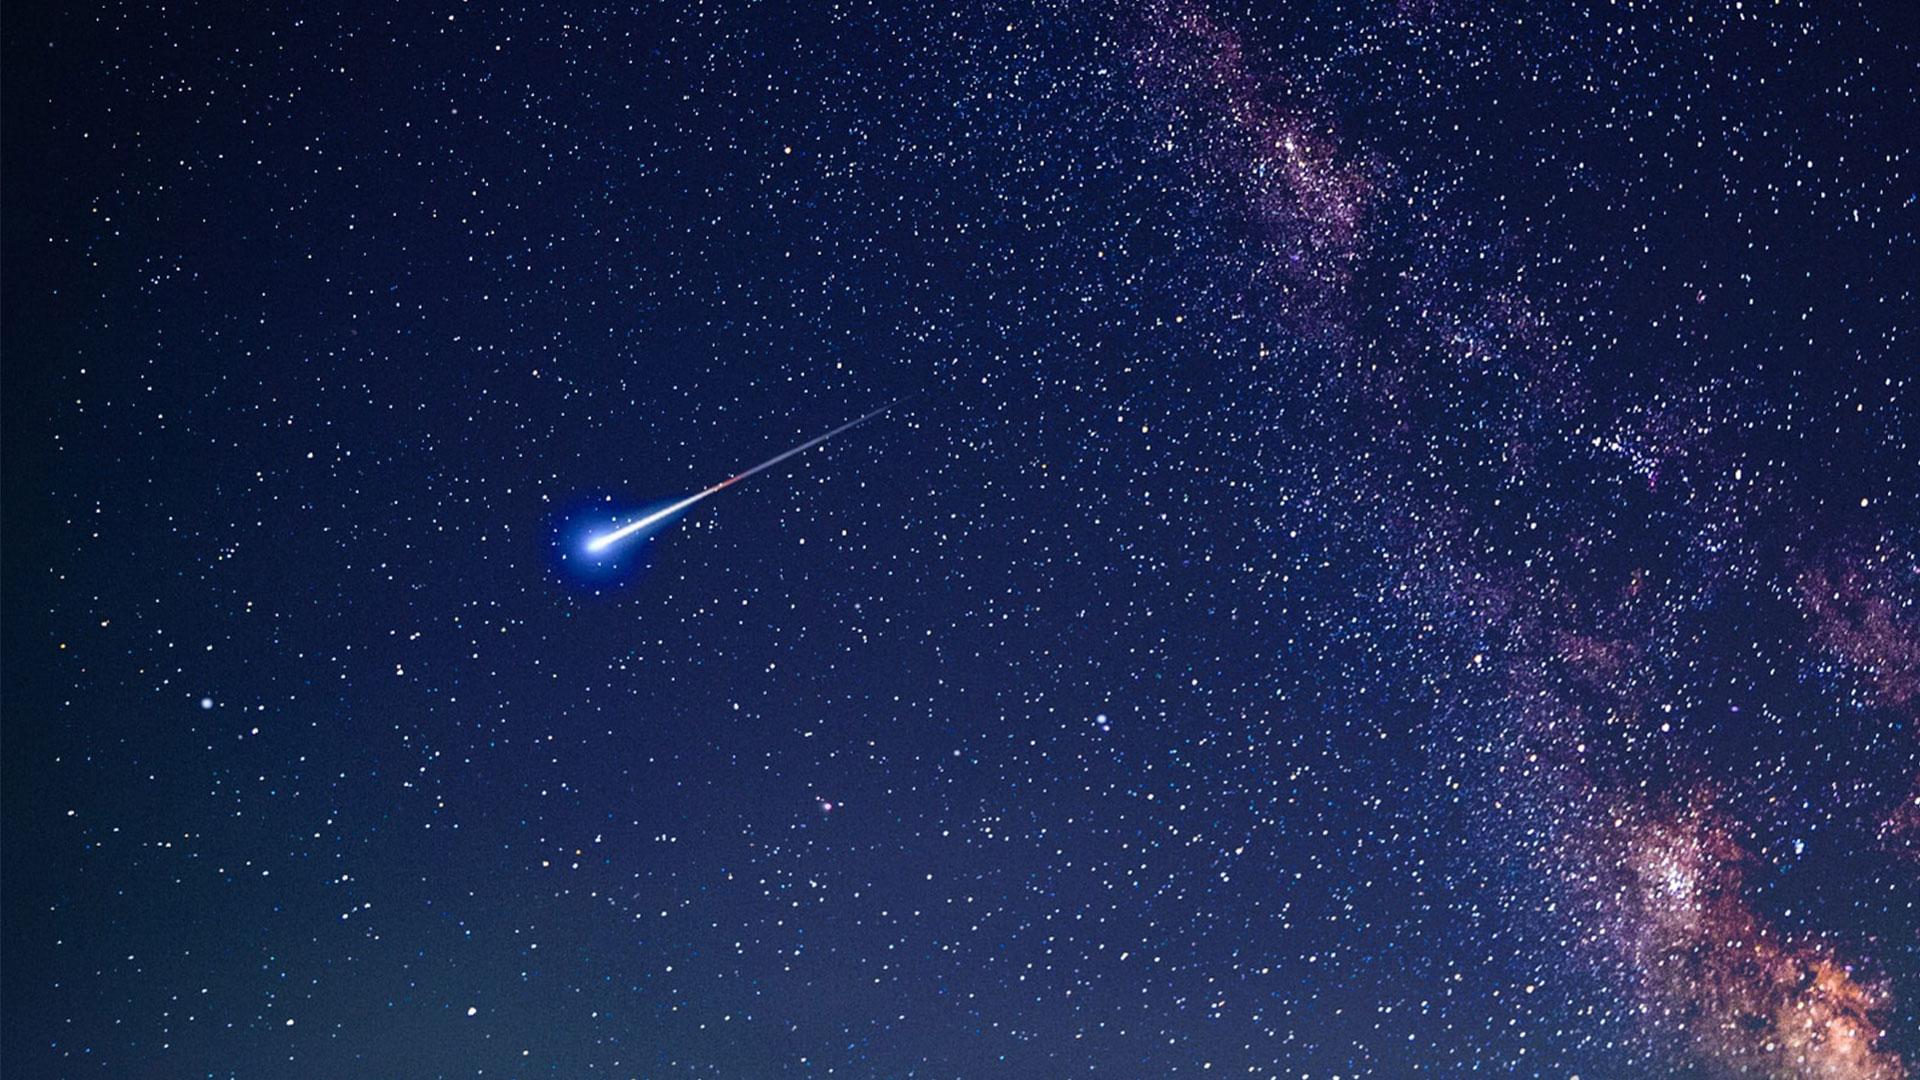 Leuchtendes Objekt am Nachthimmel.